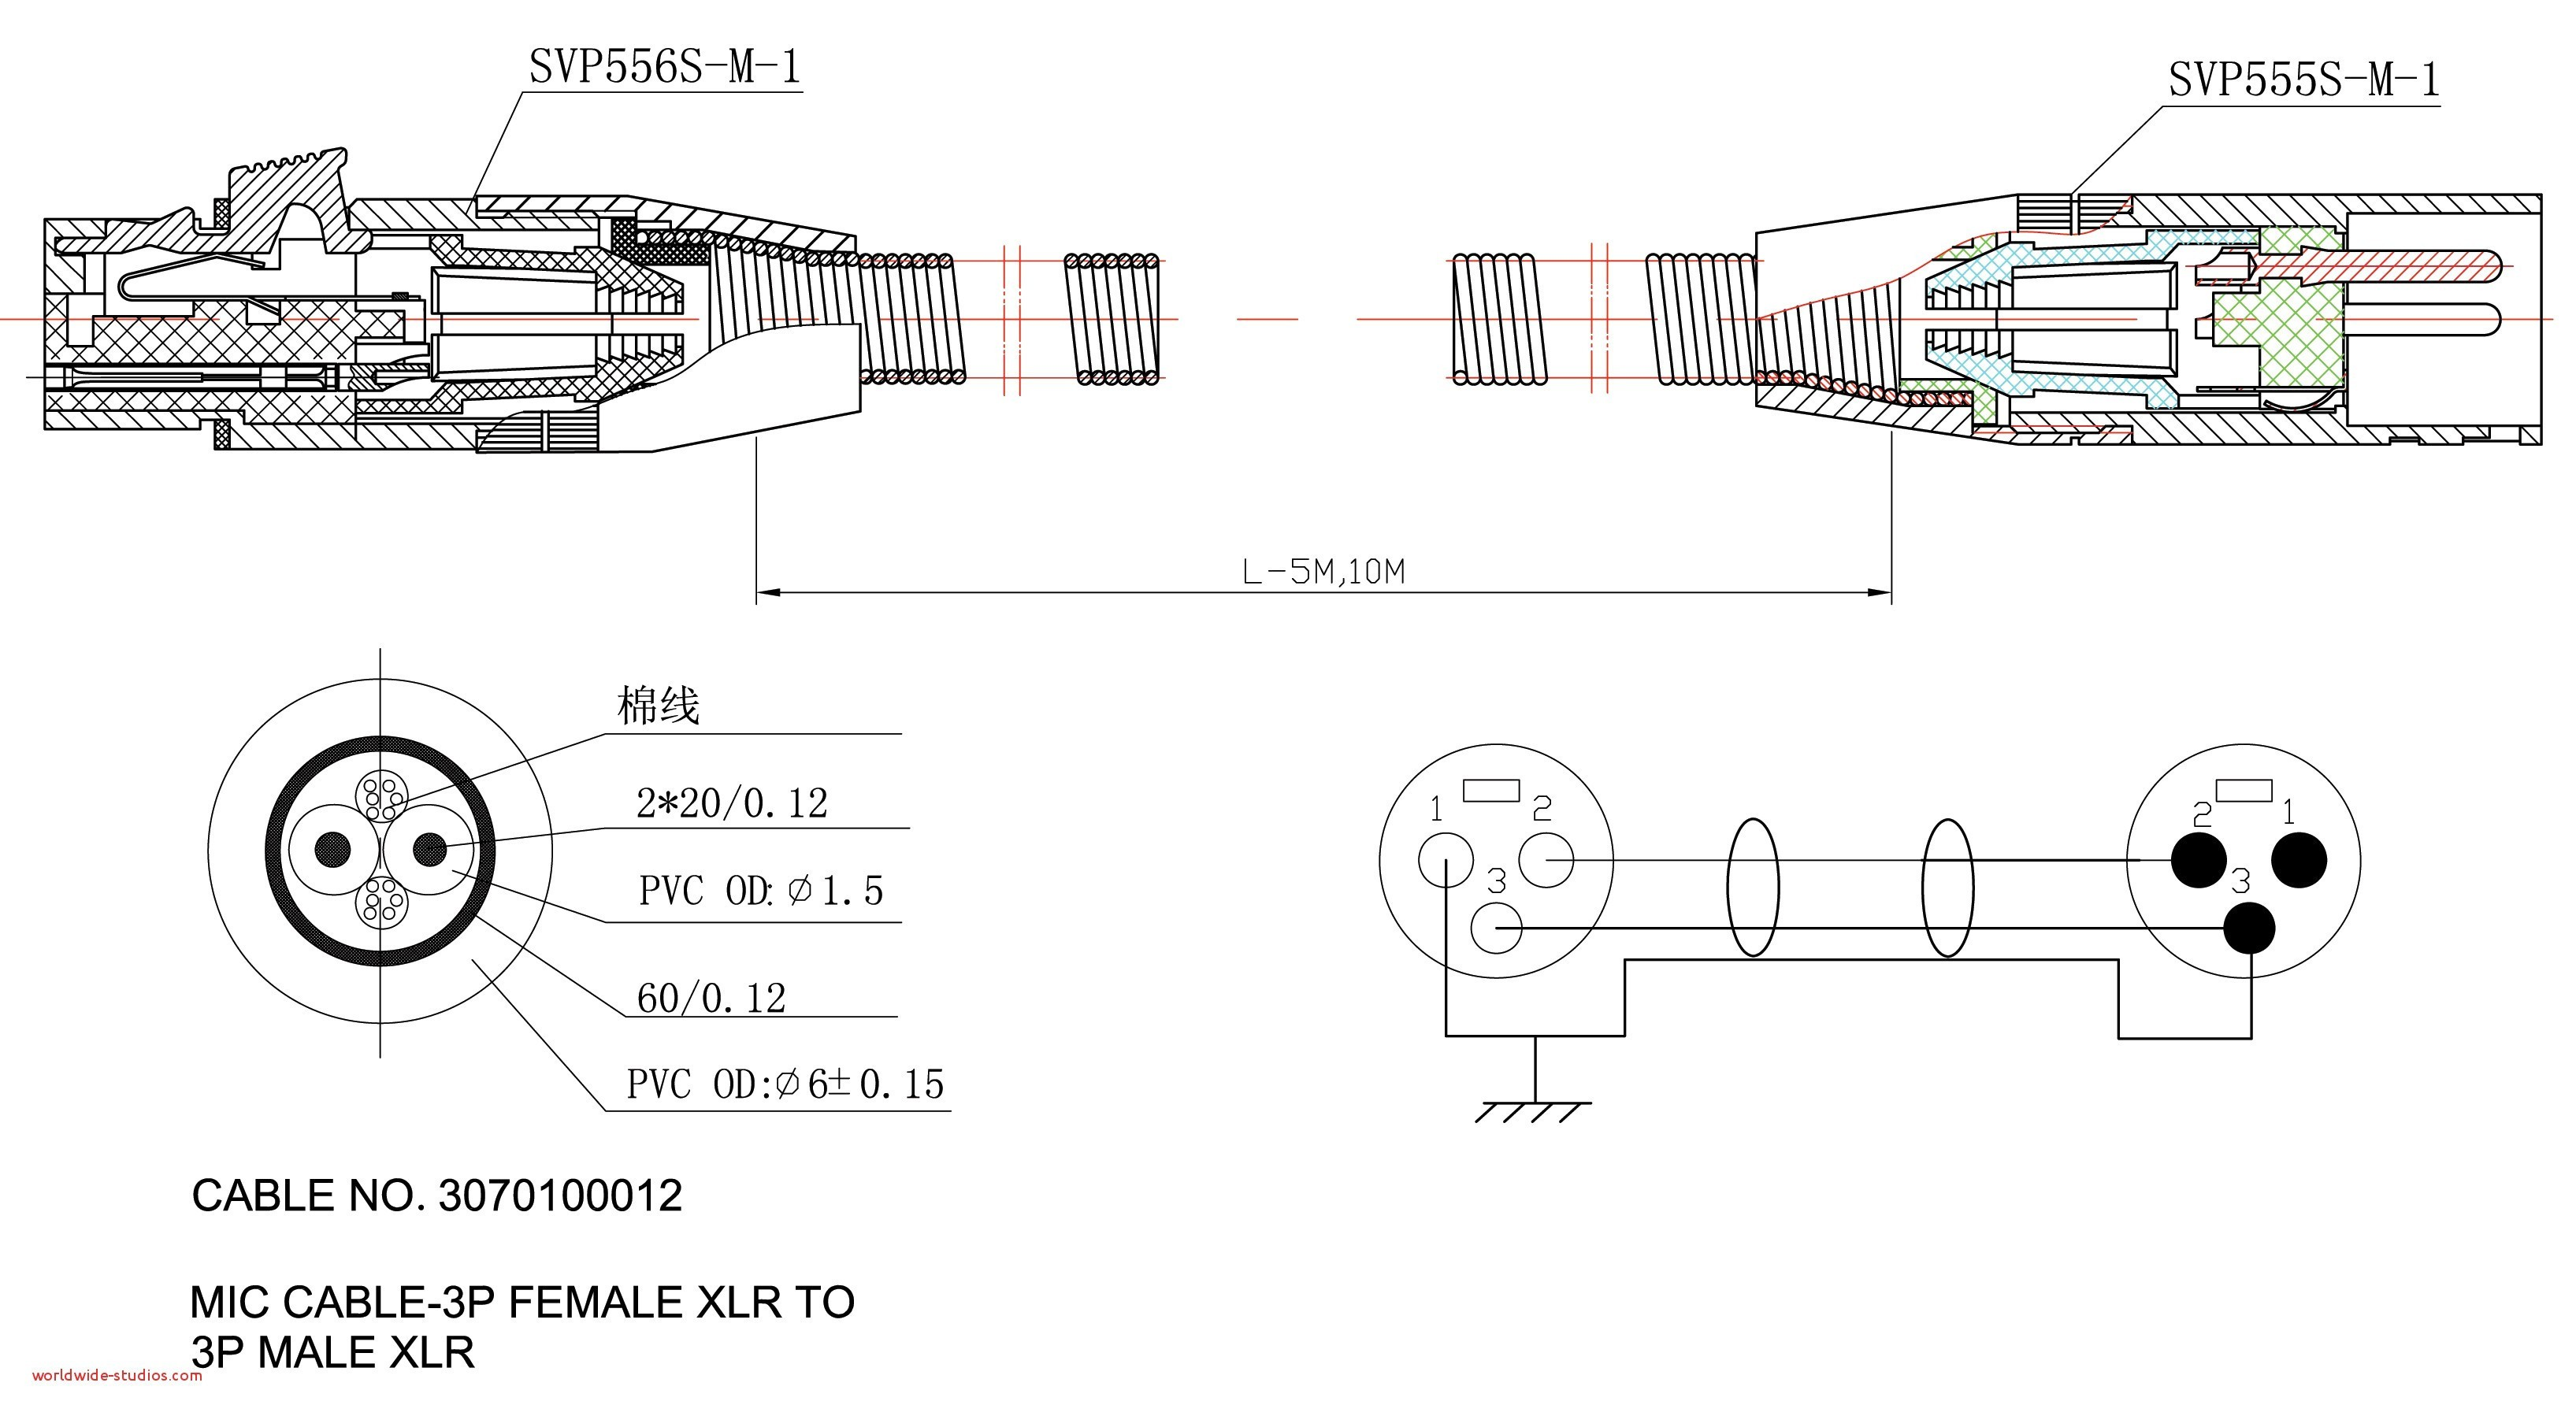 Westinghouse Ac Motor Wiring Diagram Eicp 6 0 Wiring Diagram 03 Wiring Diagram toolbox Of Westinghouse Ac Motor Wiring Diagram